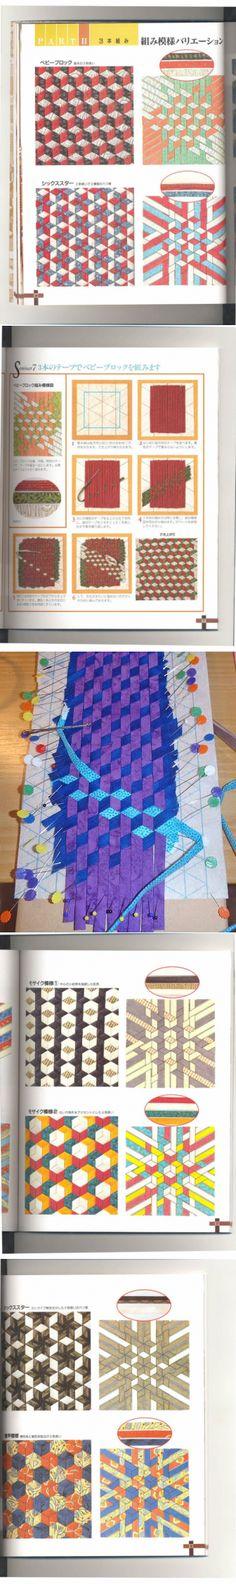 thebestartt.com / Японское Плетение из Лент